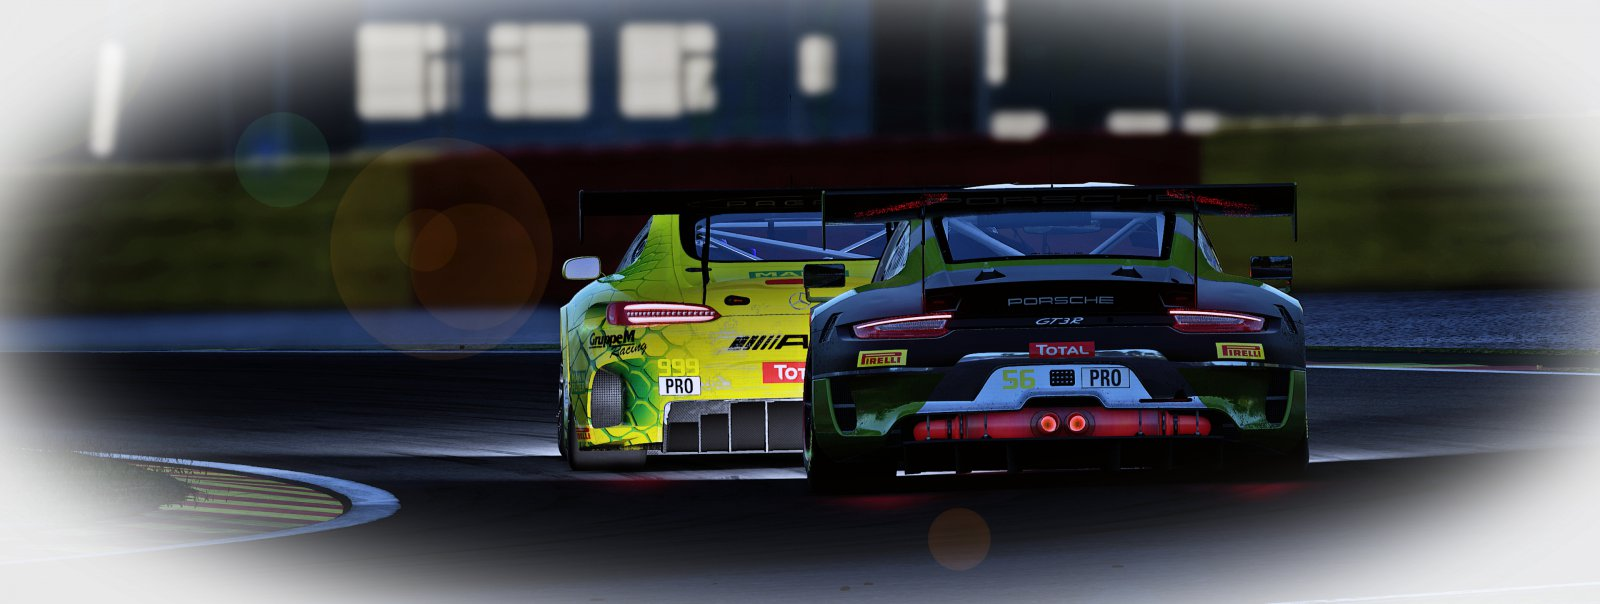 Assetto Corsa Competizione Screenshot 2019.12.18 - 13.11.01.28.jpg